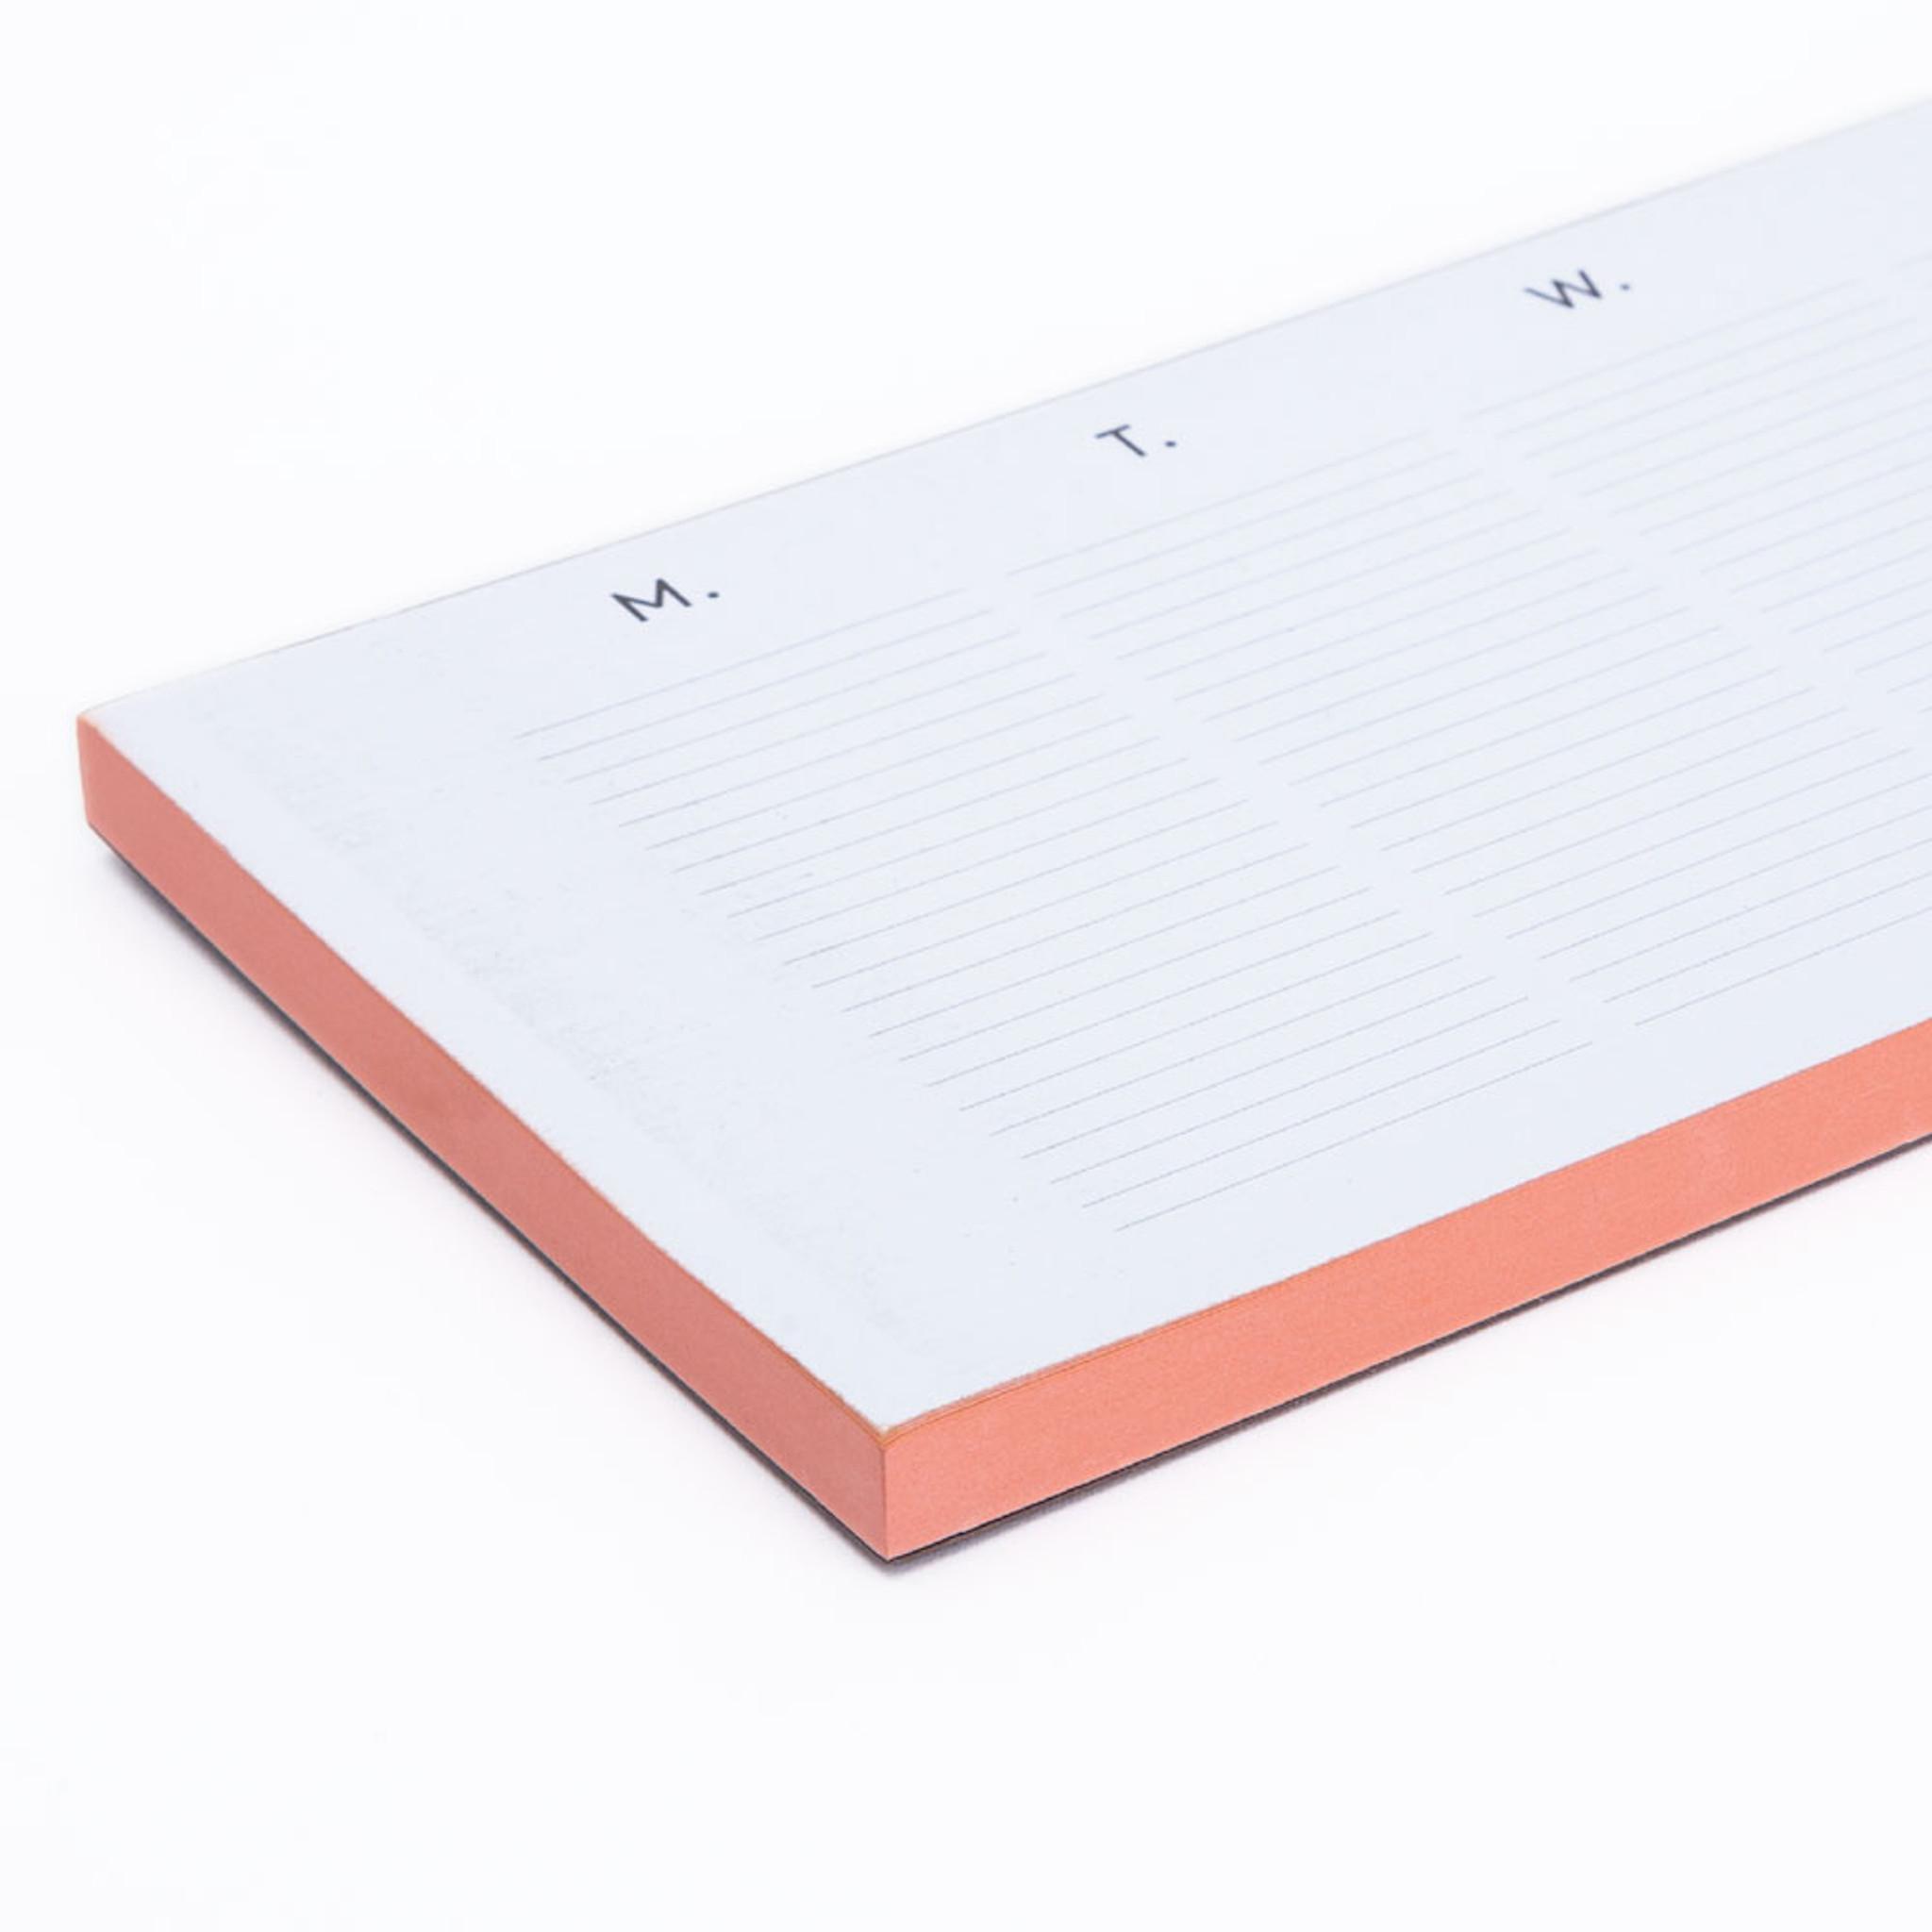 Pink Edged Weekly Planner Desk Pad By Wms Co Fieldshop By Garden Gun